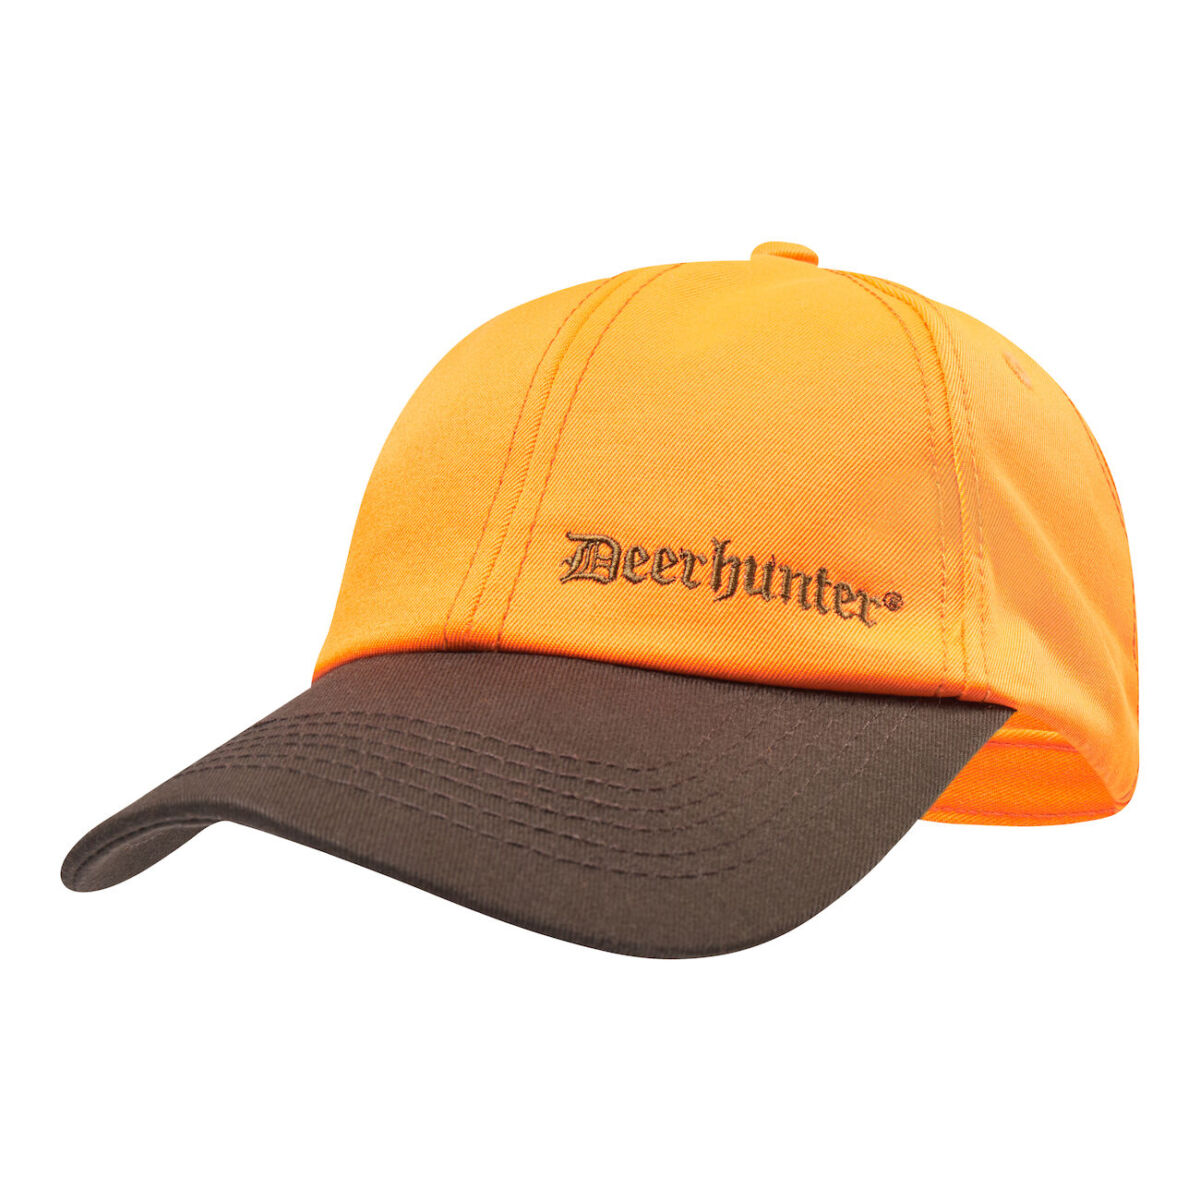 Кепки, шапки, шляпы